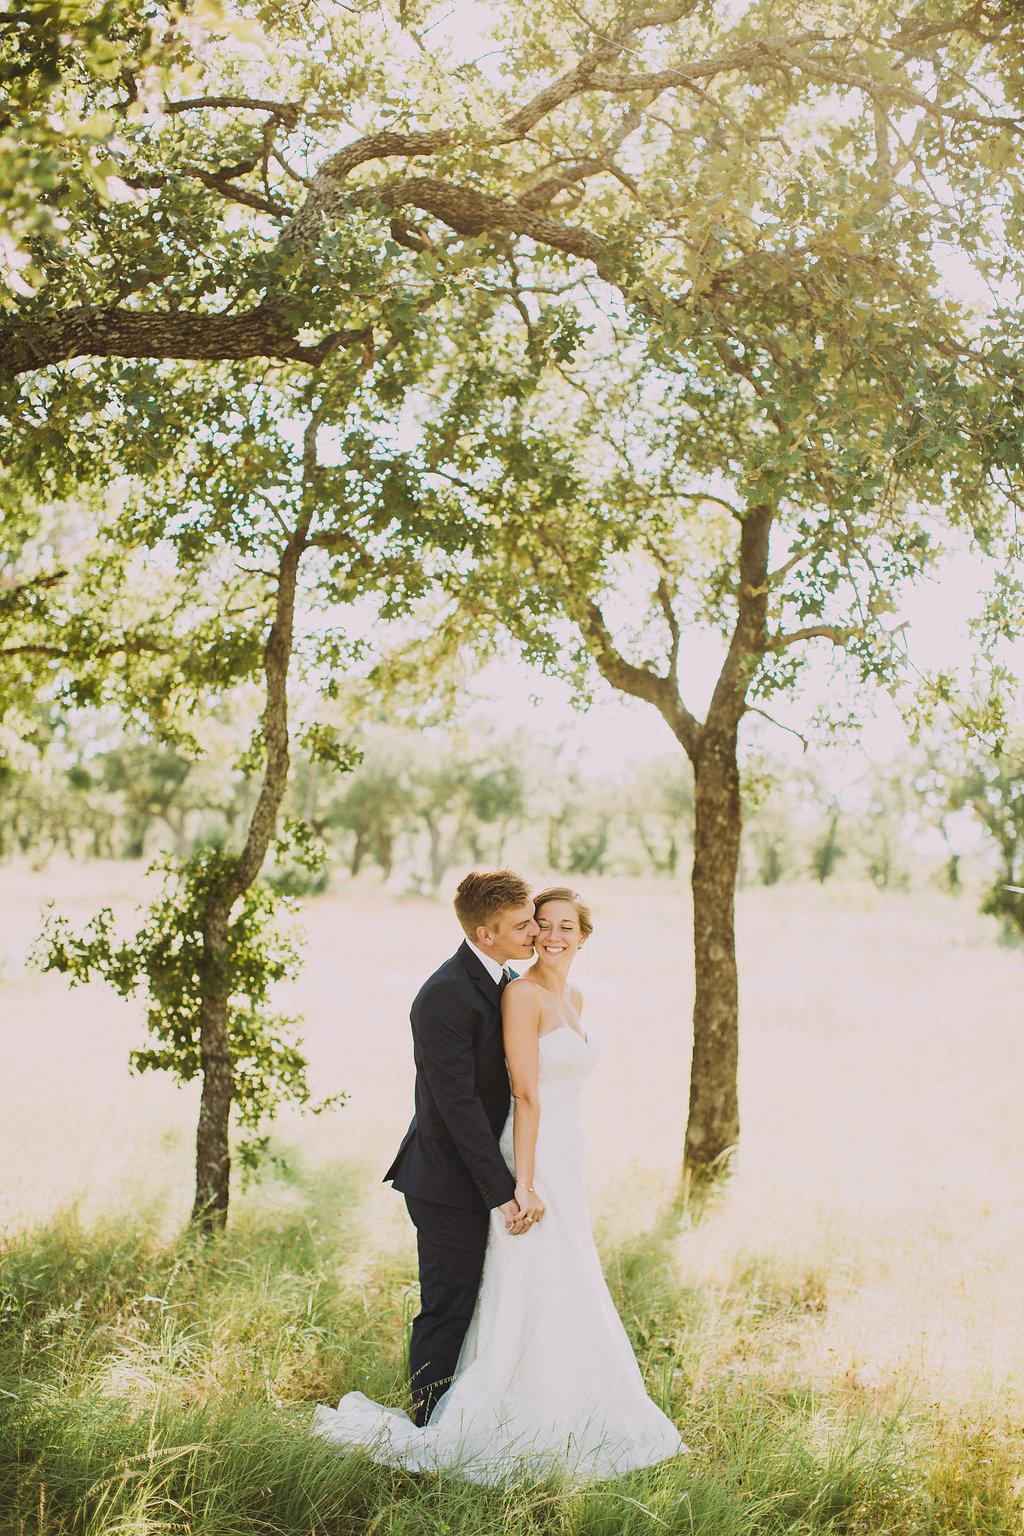 brian+annie_wedding-225.jpg